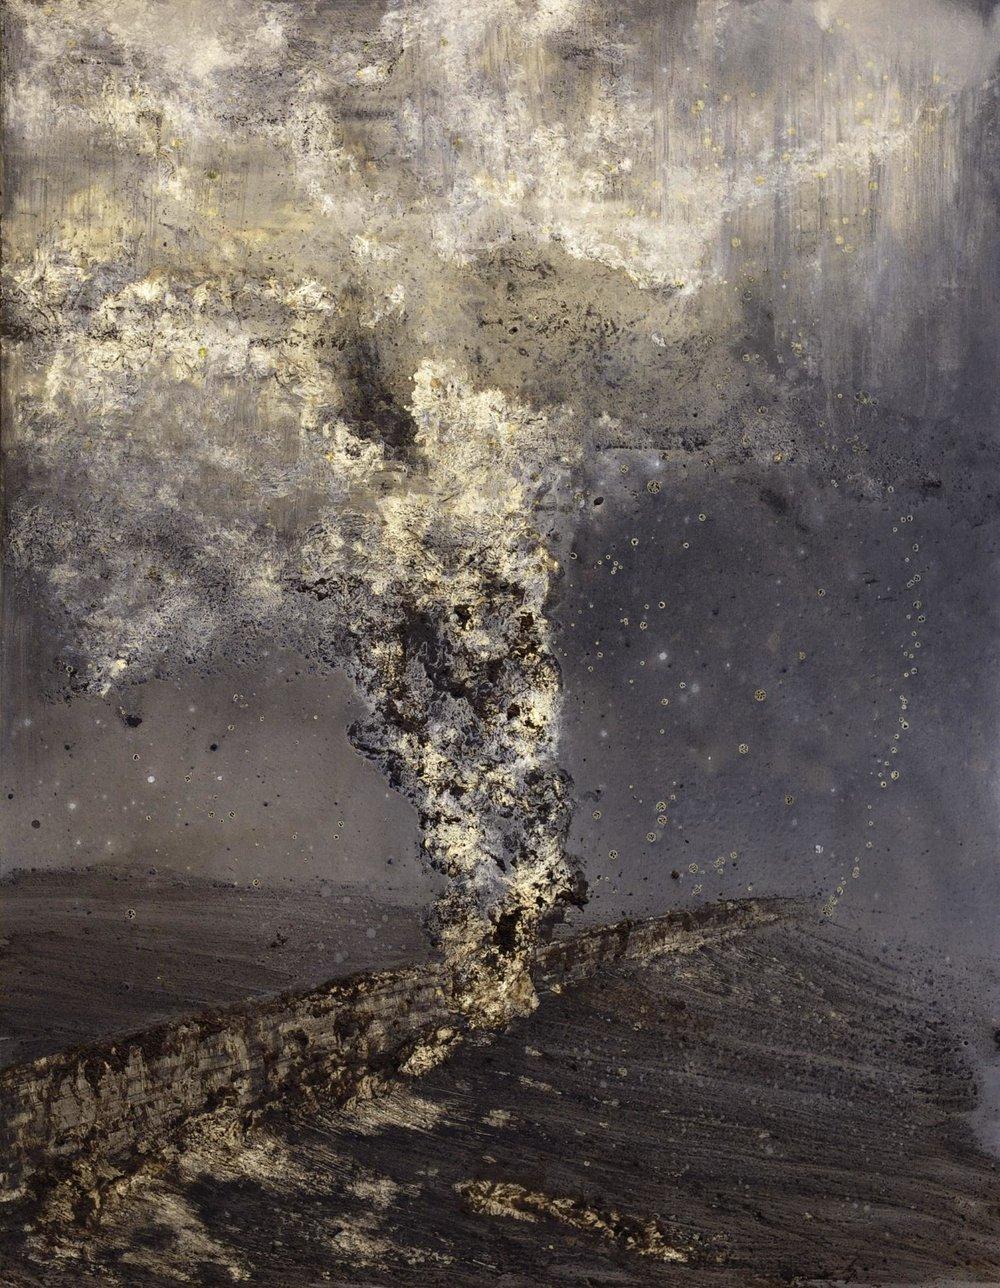 Untitled (smoke) Mixed-media on canvas  100 x 150cm 2014